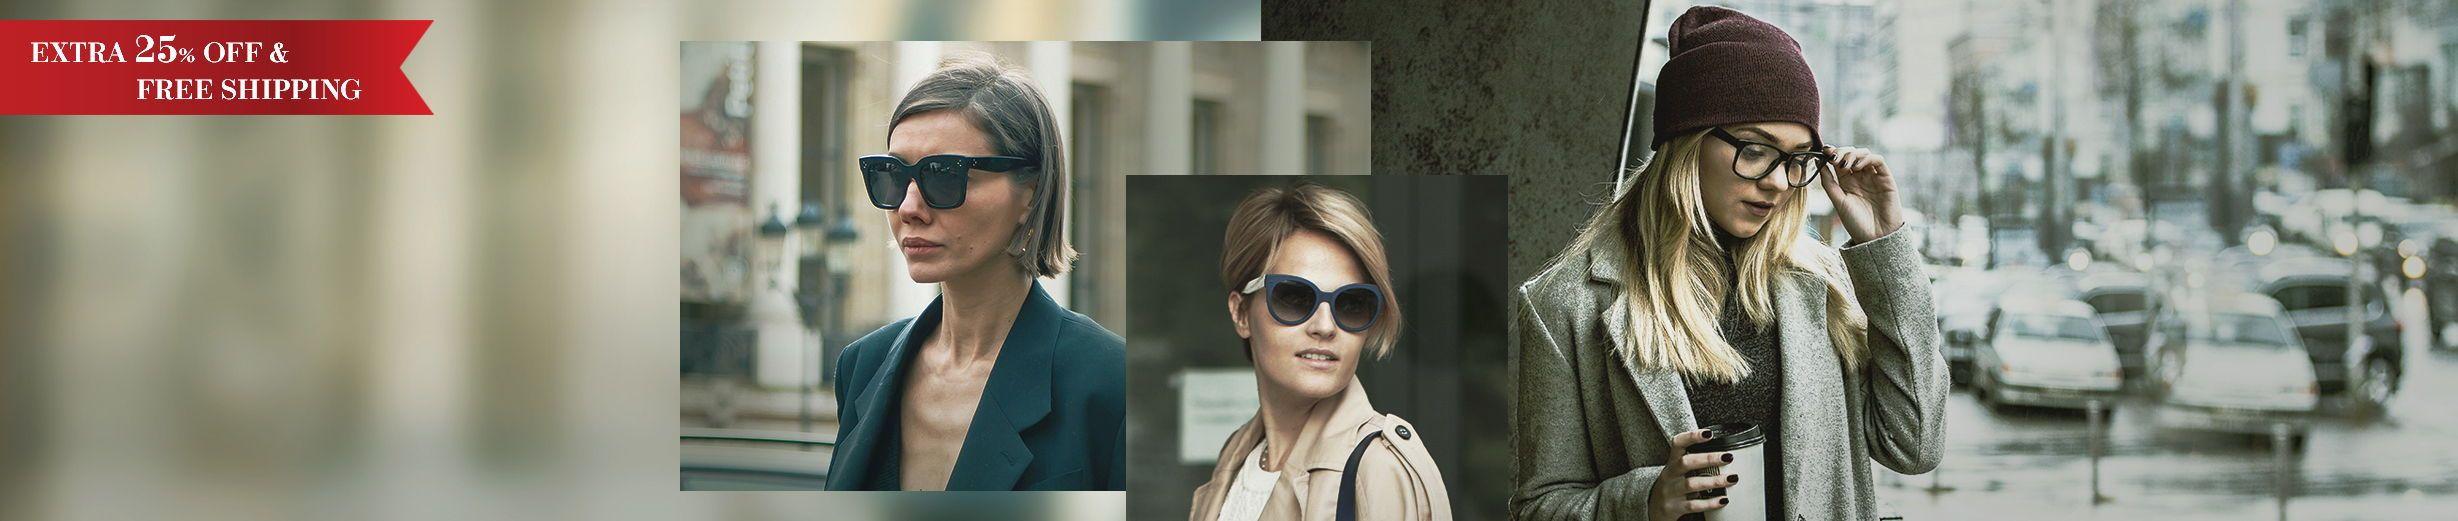 Glassesgallery - Woman eyewear banner